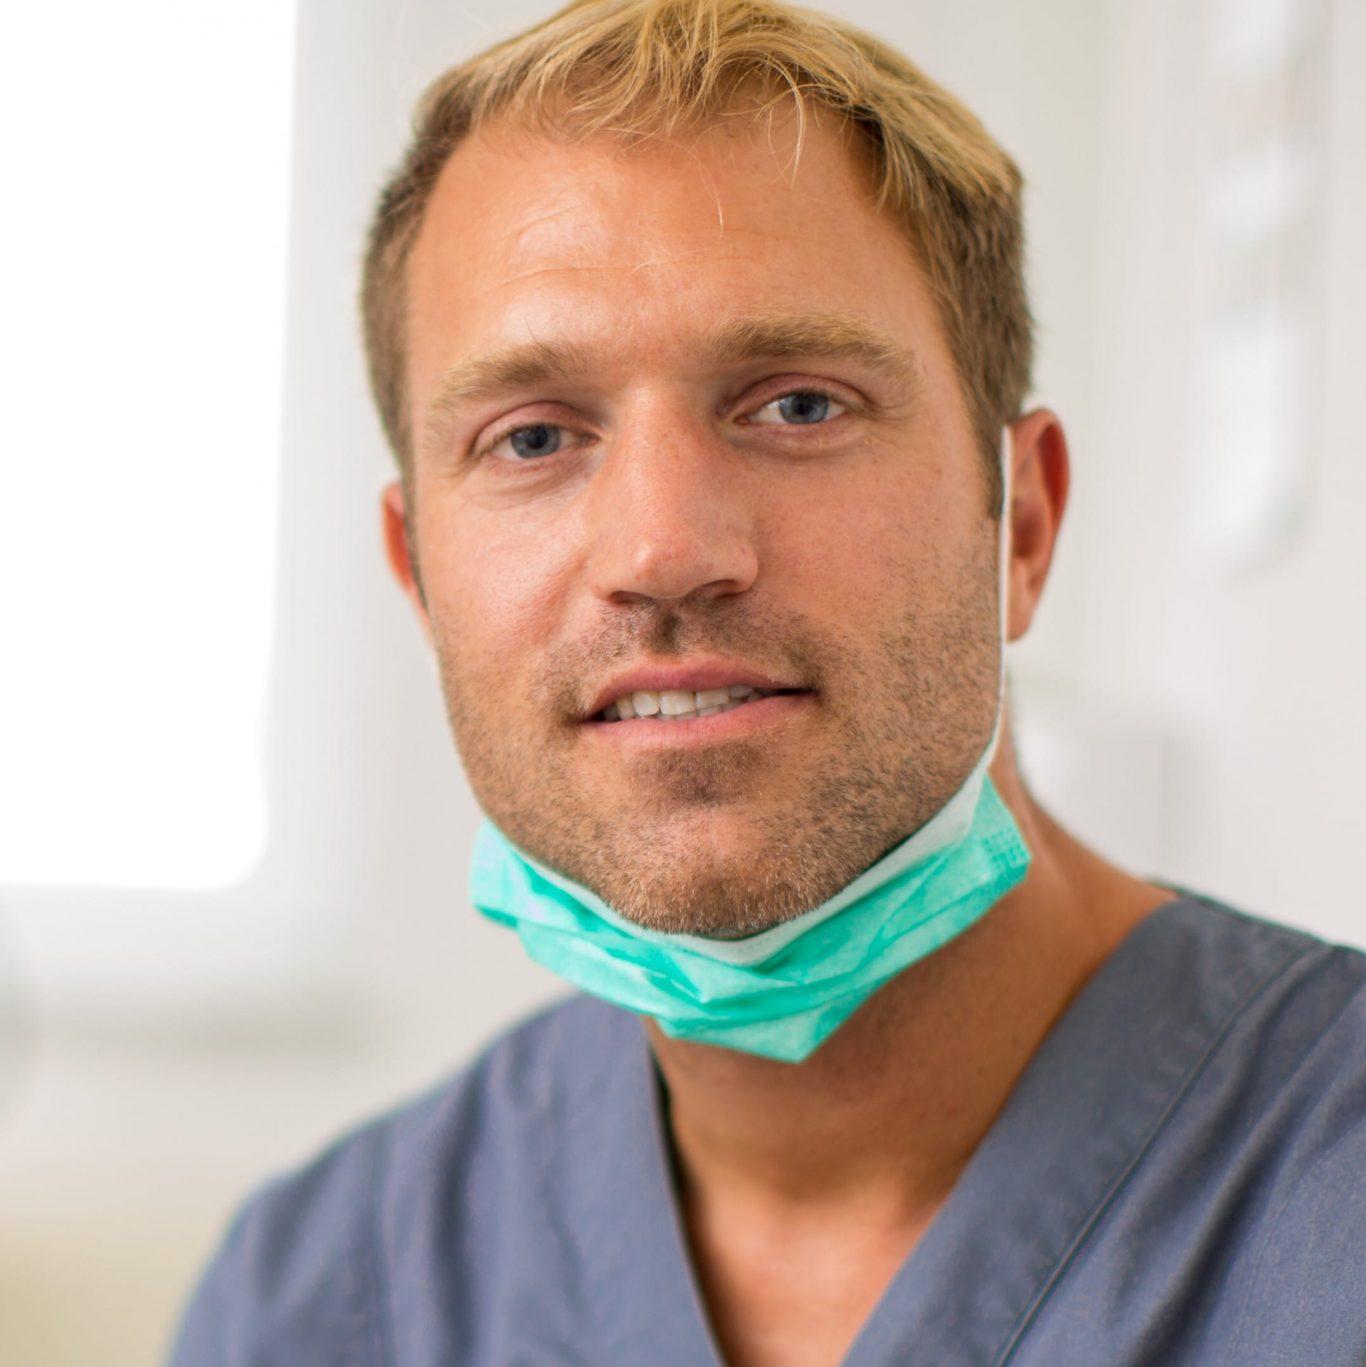 Team Praxis Dr. Huber